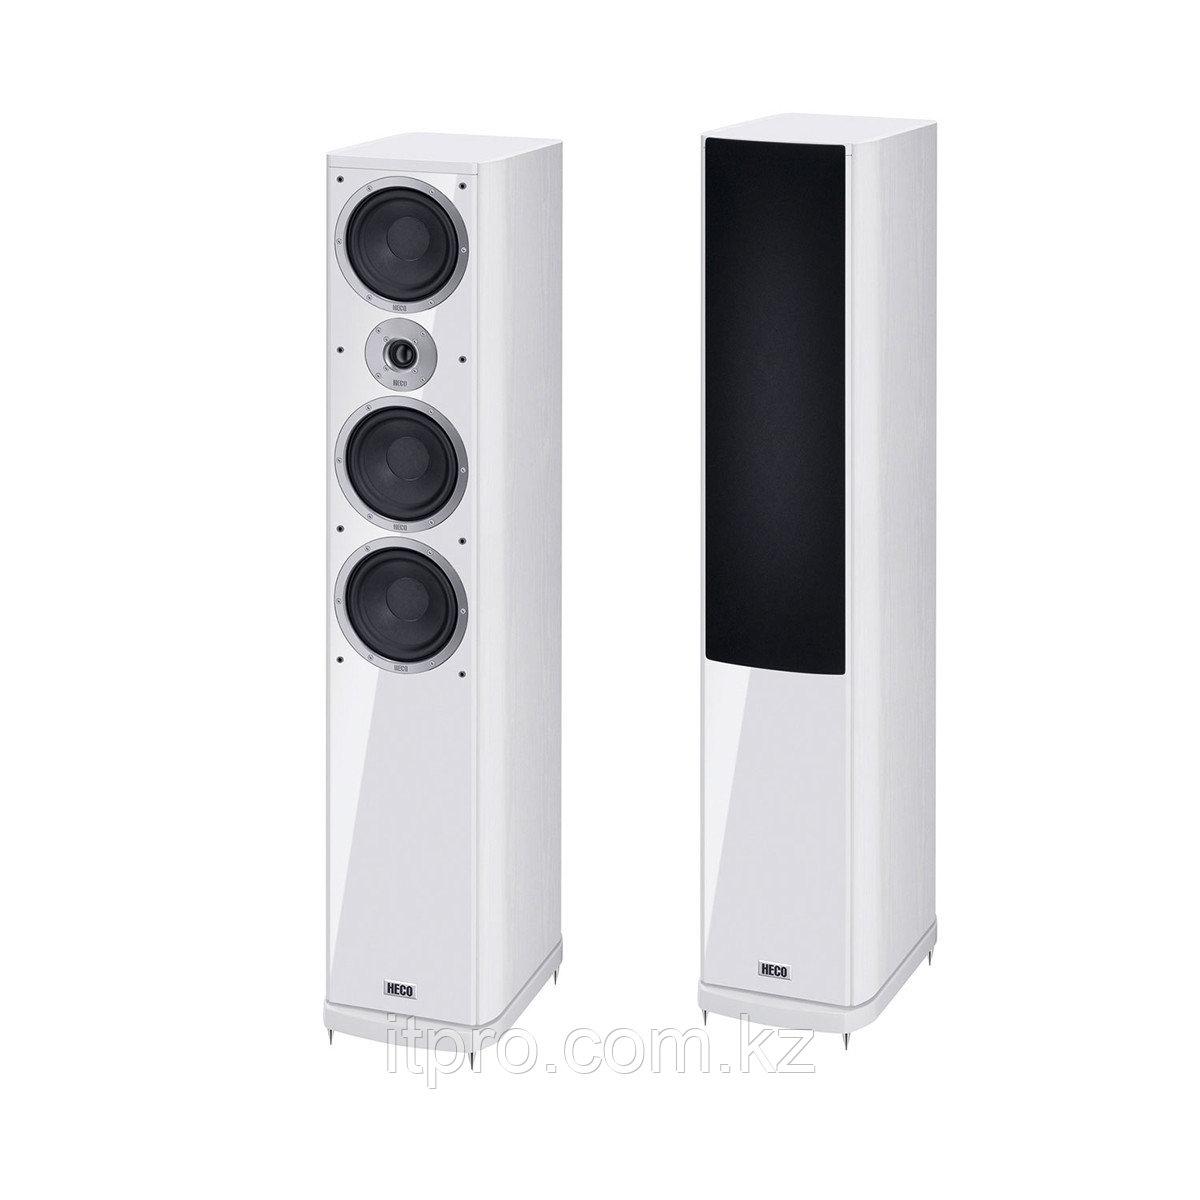 Напольная акустическая система HECO Music Style 900 white